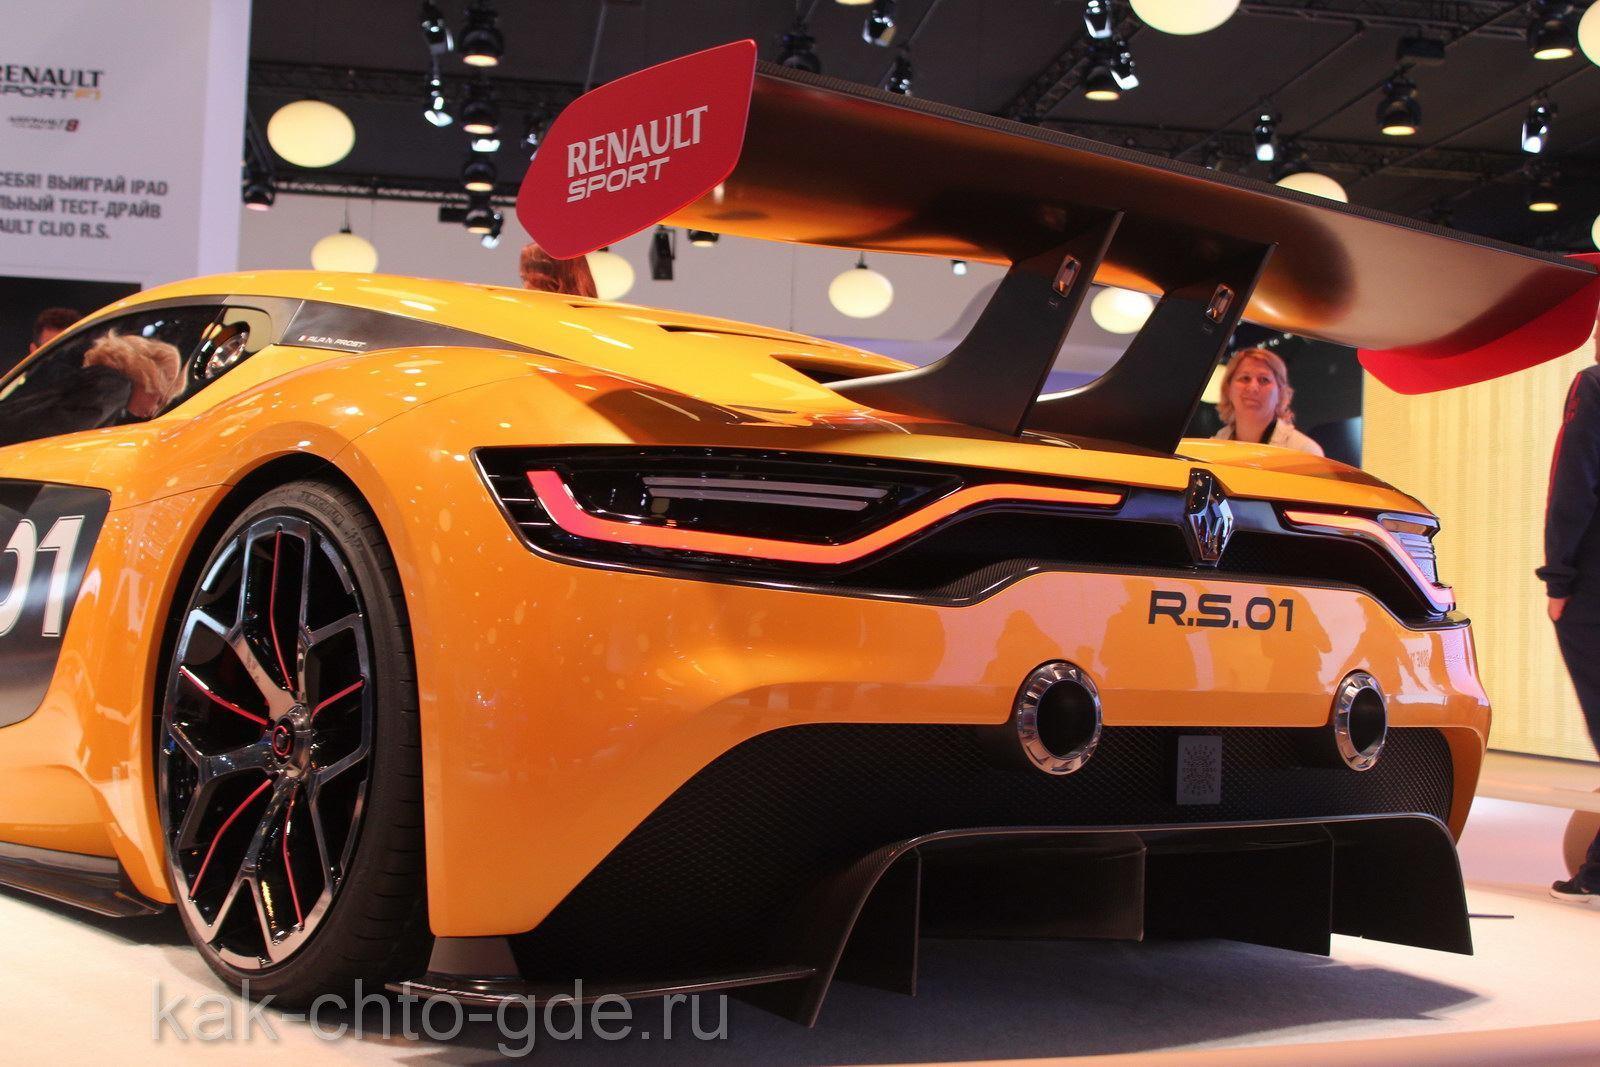 Новое спорт-купе Renault Sport R.S. 01